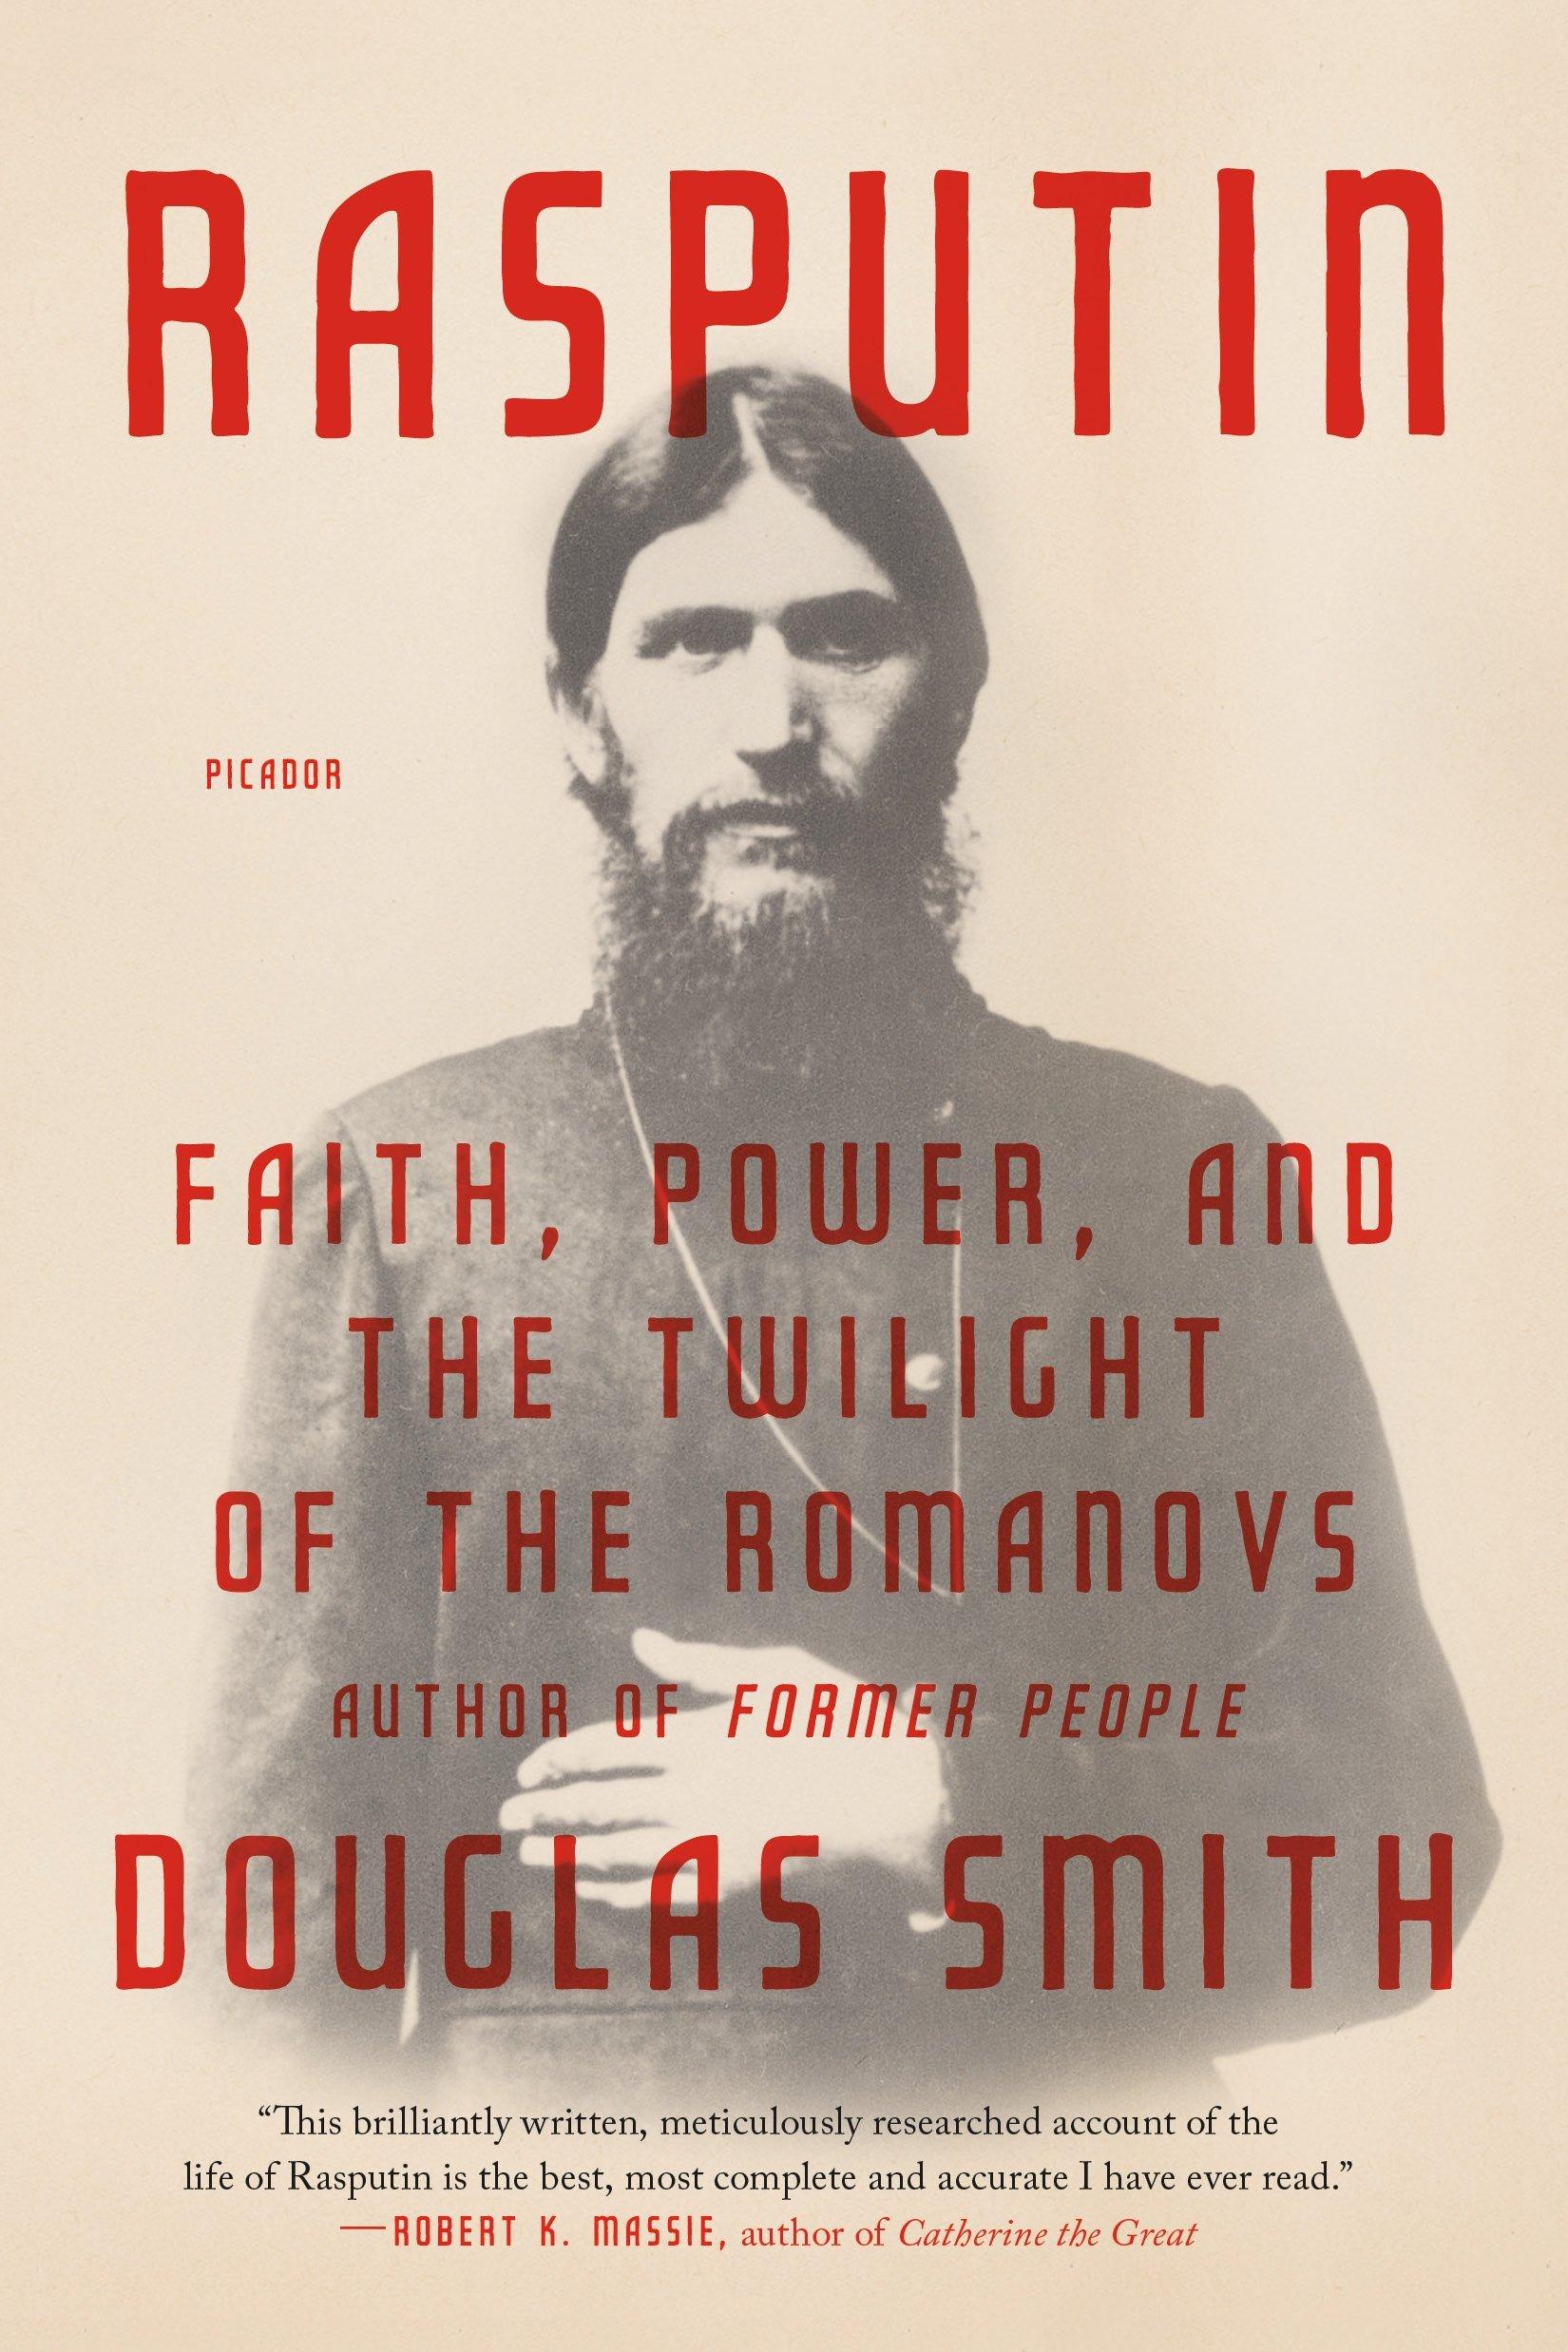 Rasputin reviewed